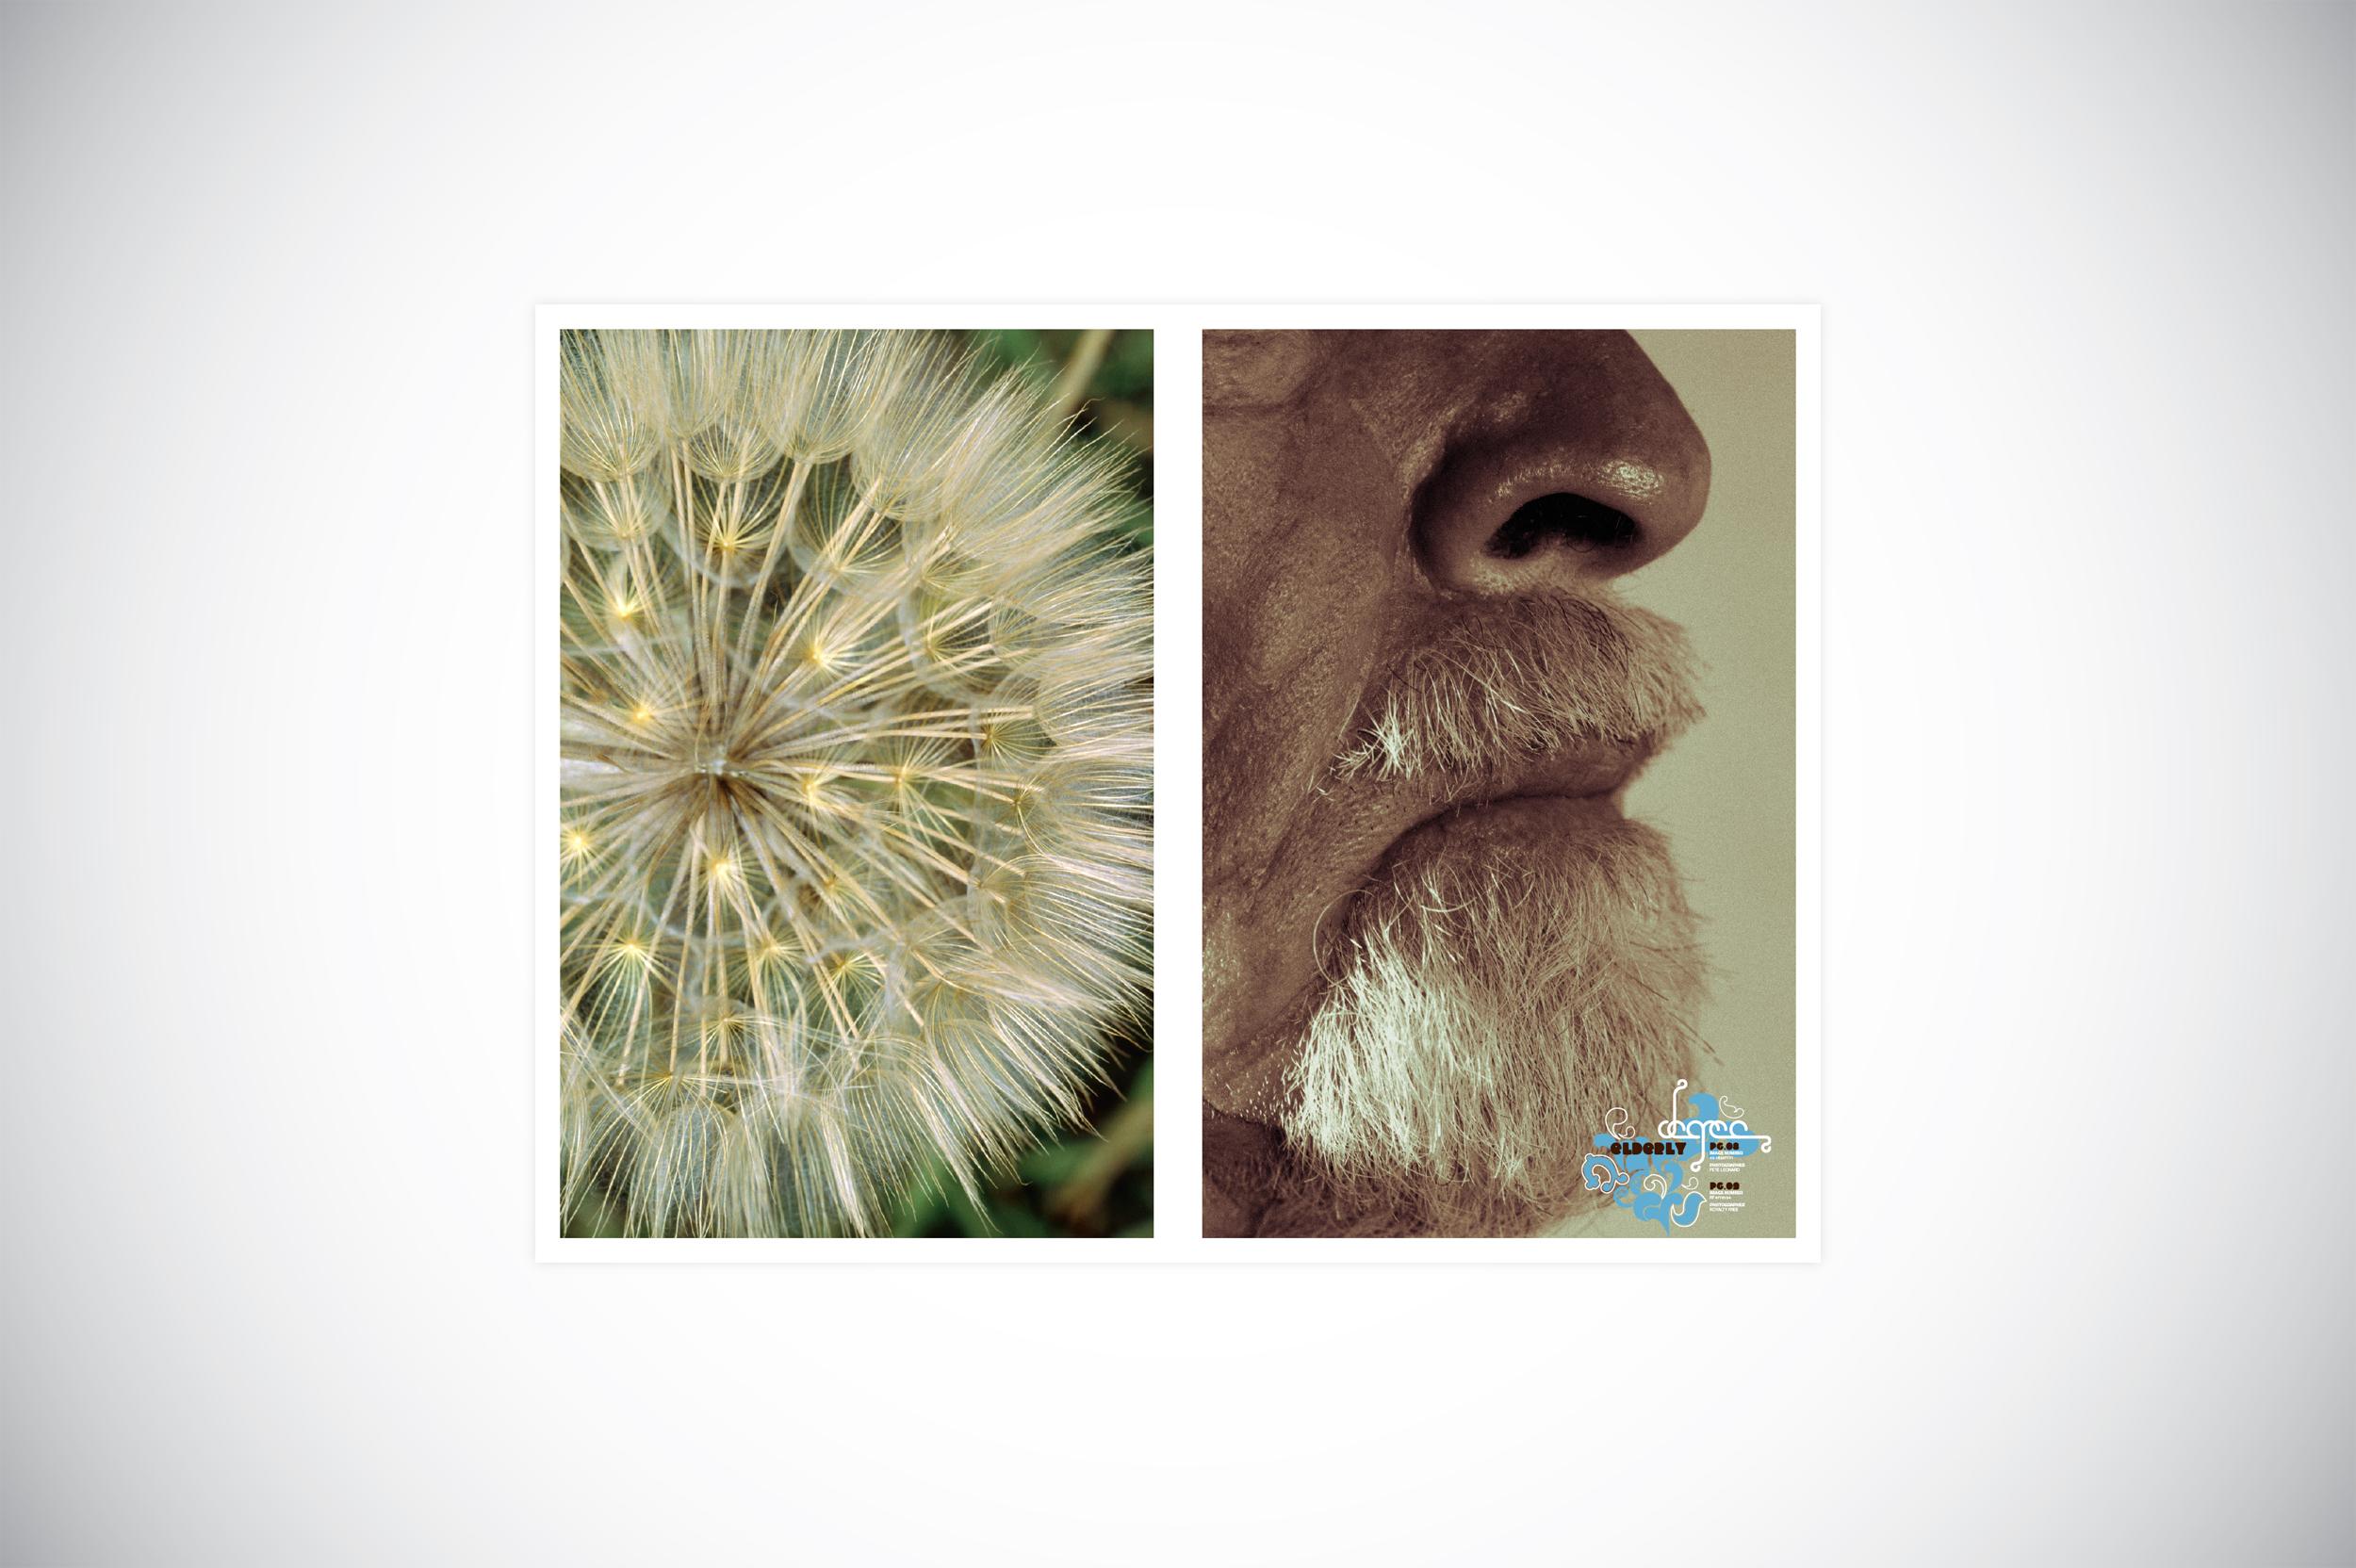 corbis_itch_fade_back_elderly_8-9_2500w.jpg